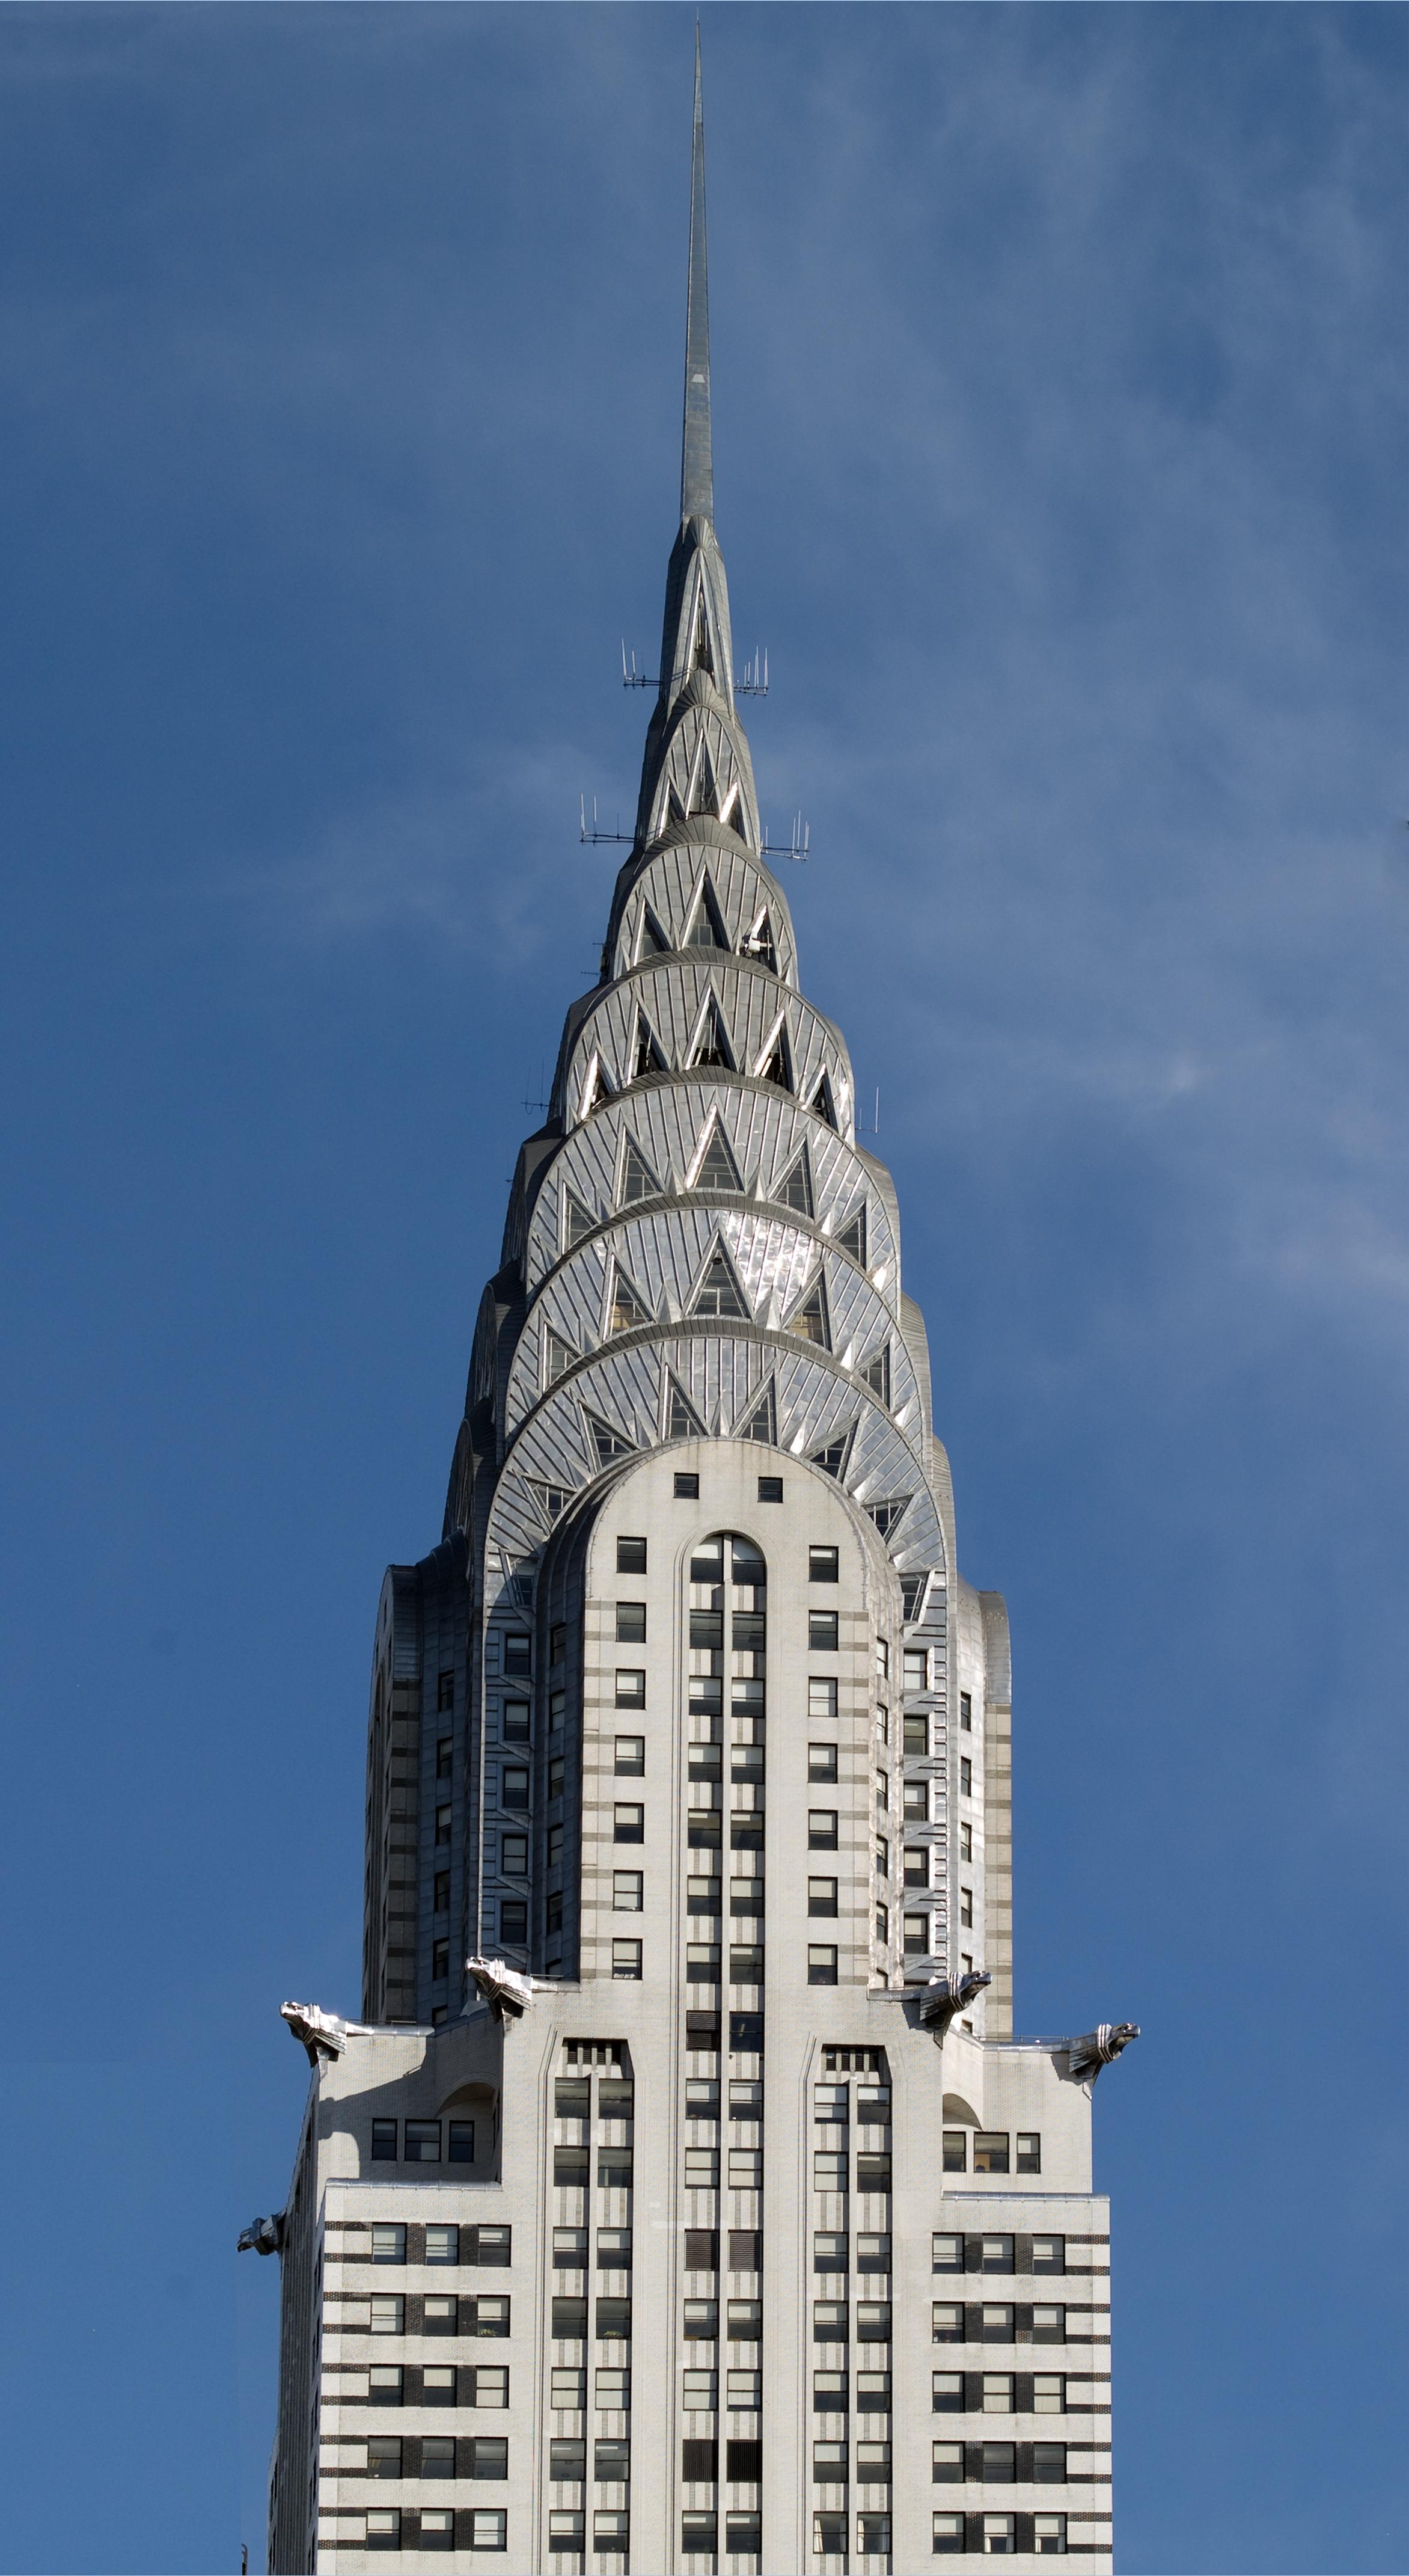 Chrysler_Building_spire,_Manhattan,_by_Carol_Highsmith_(LOC_highsm.04444).jpg